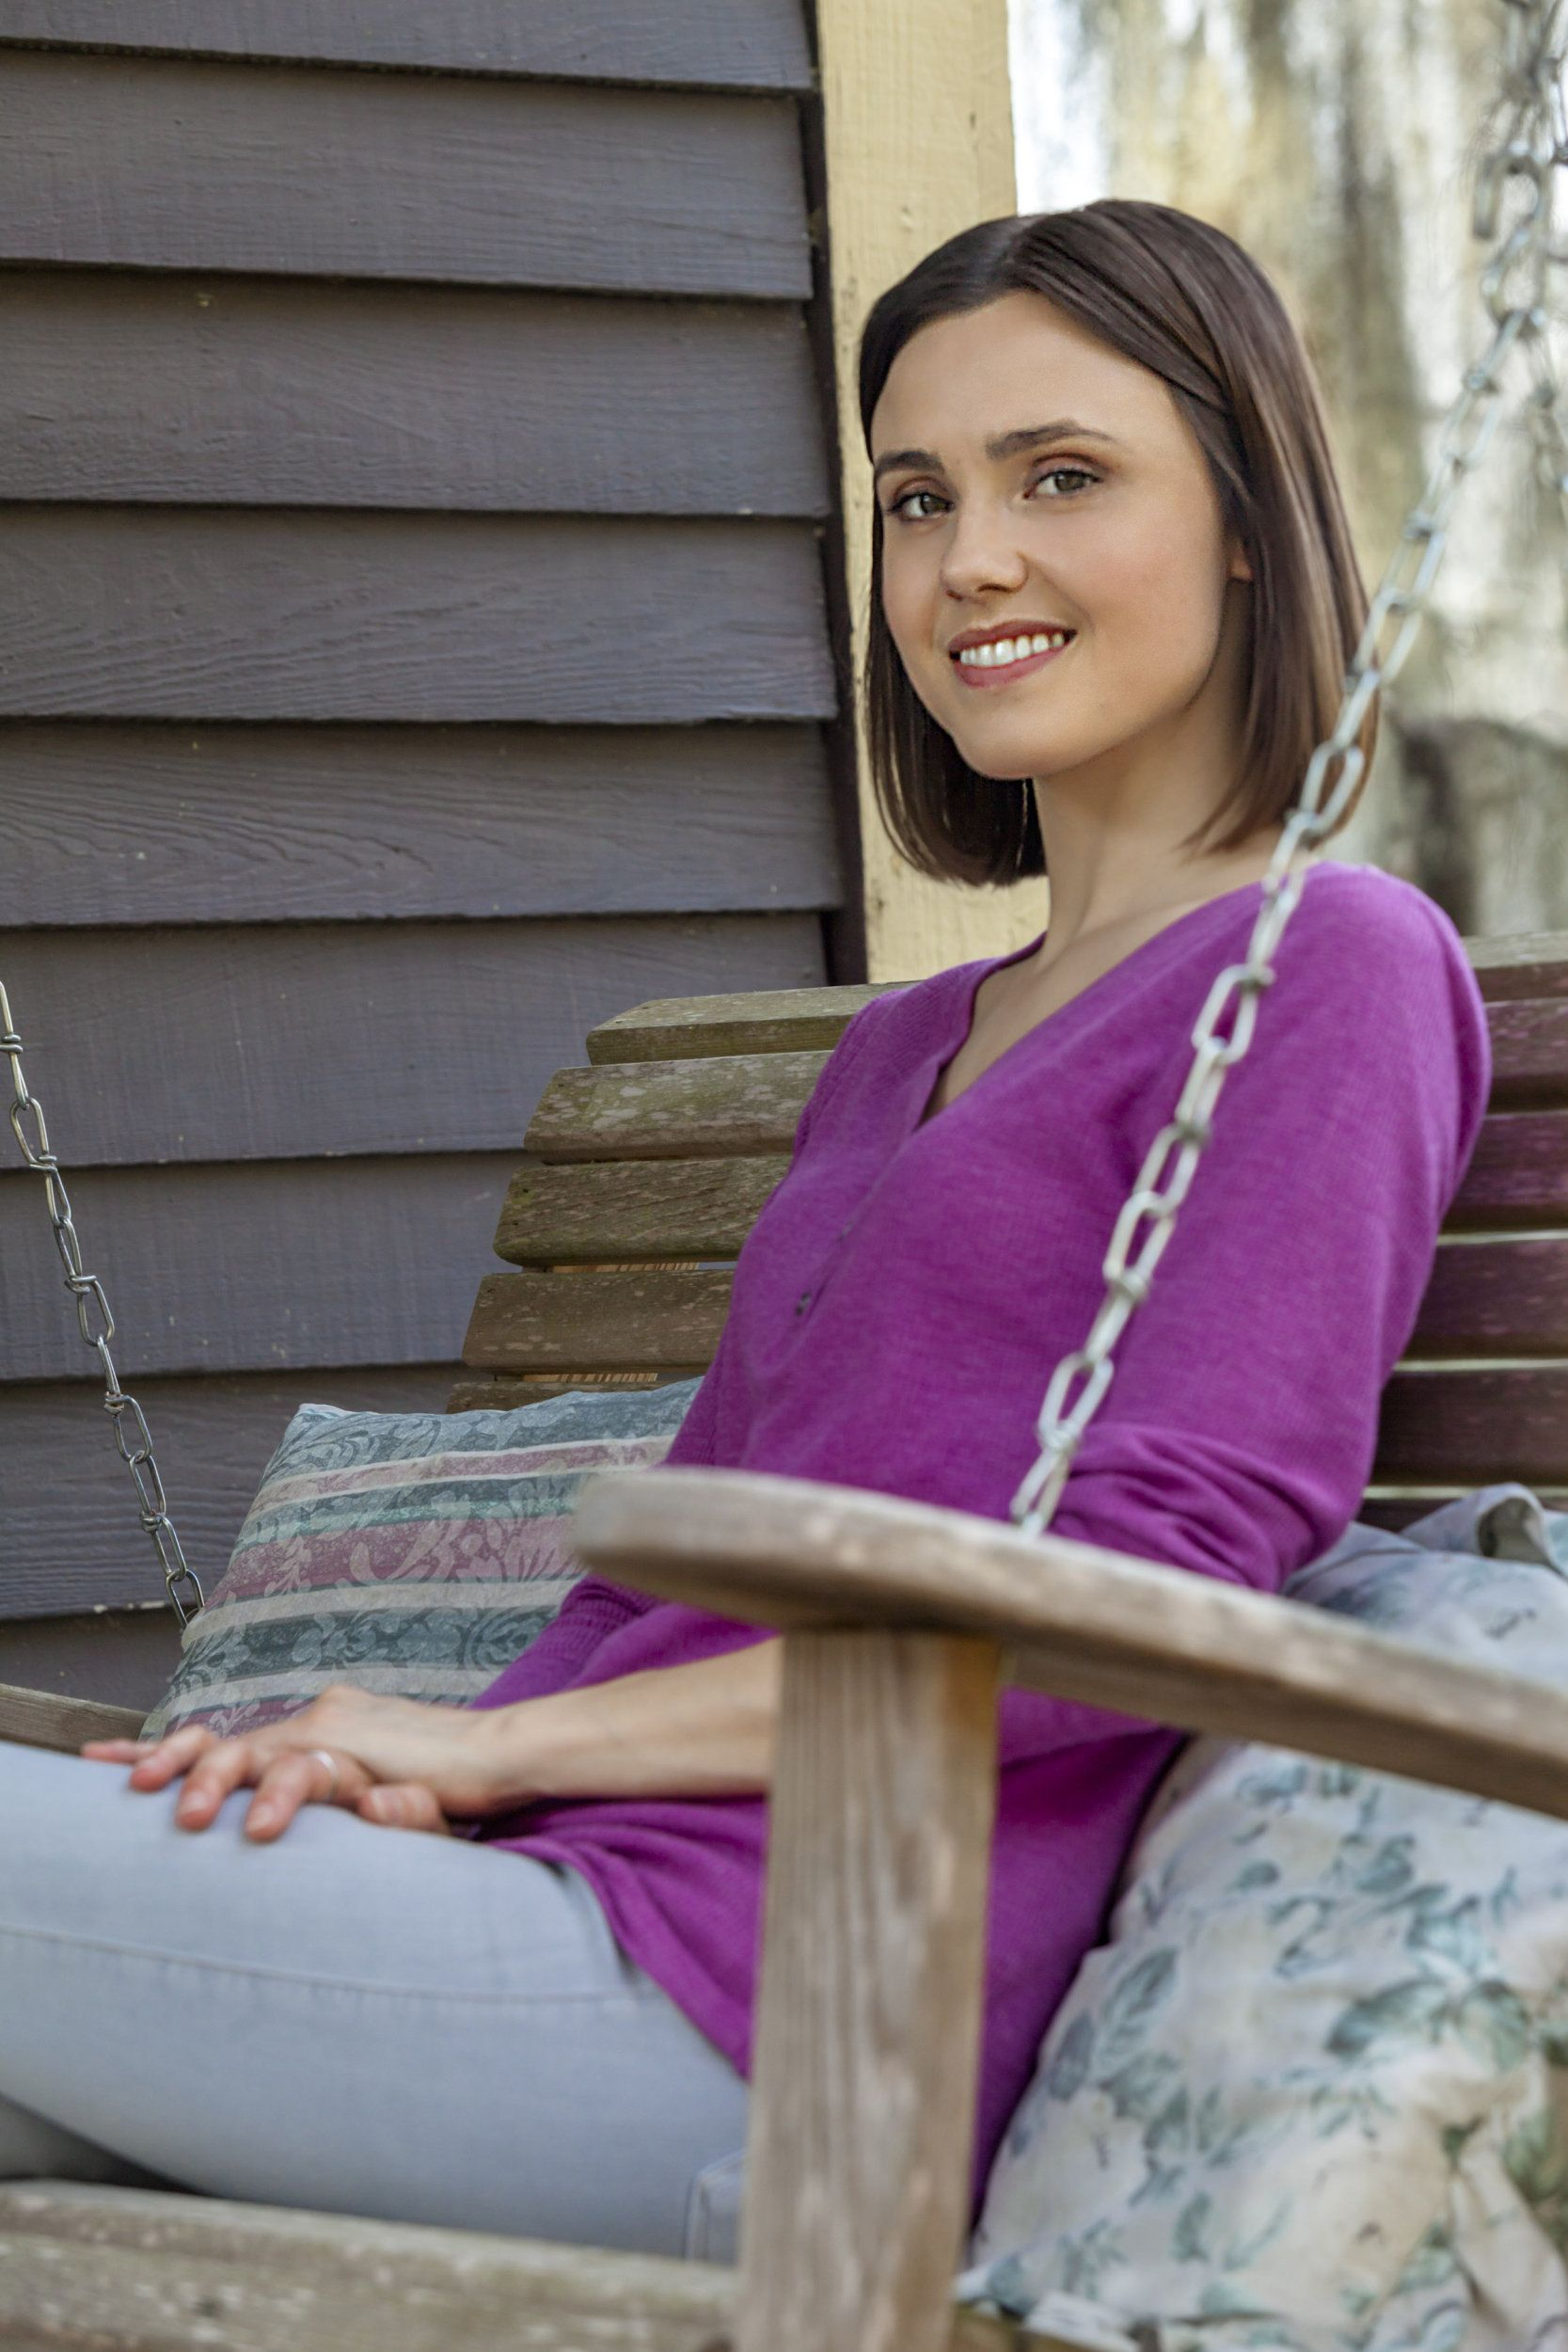 Discussion on this topic: Zena Marshall, poppy-drayton-born-1991/